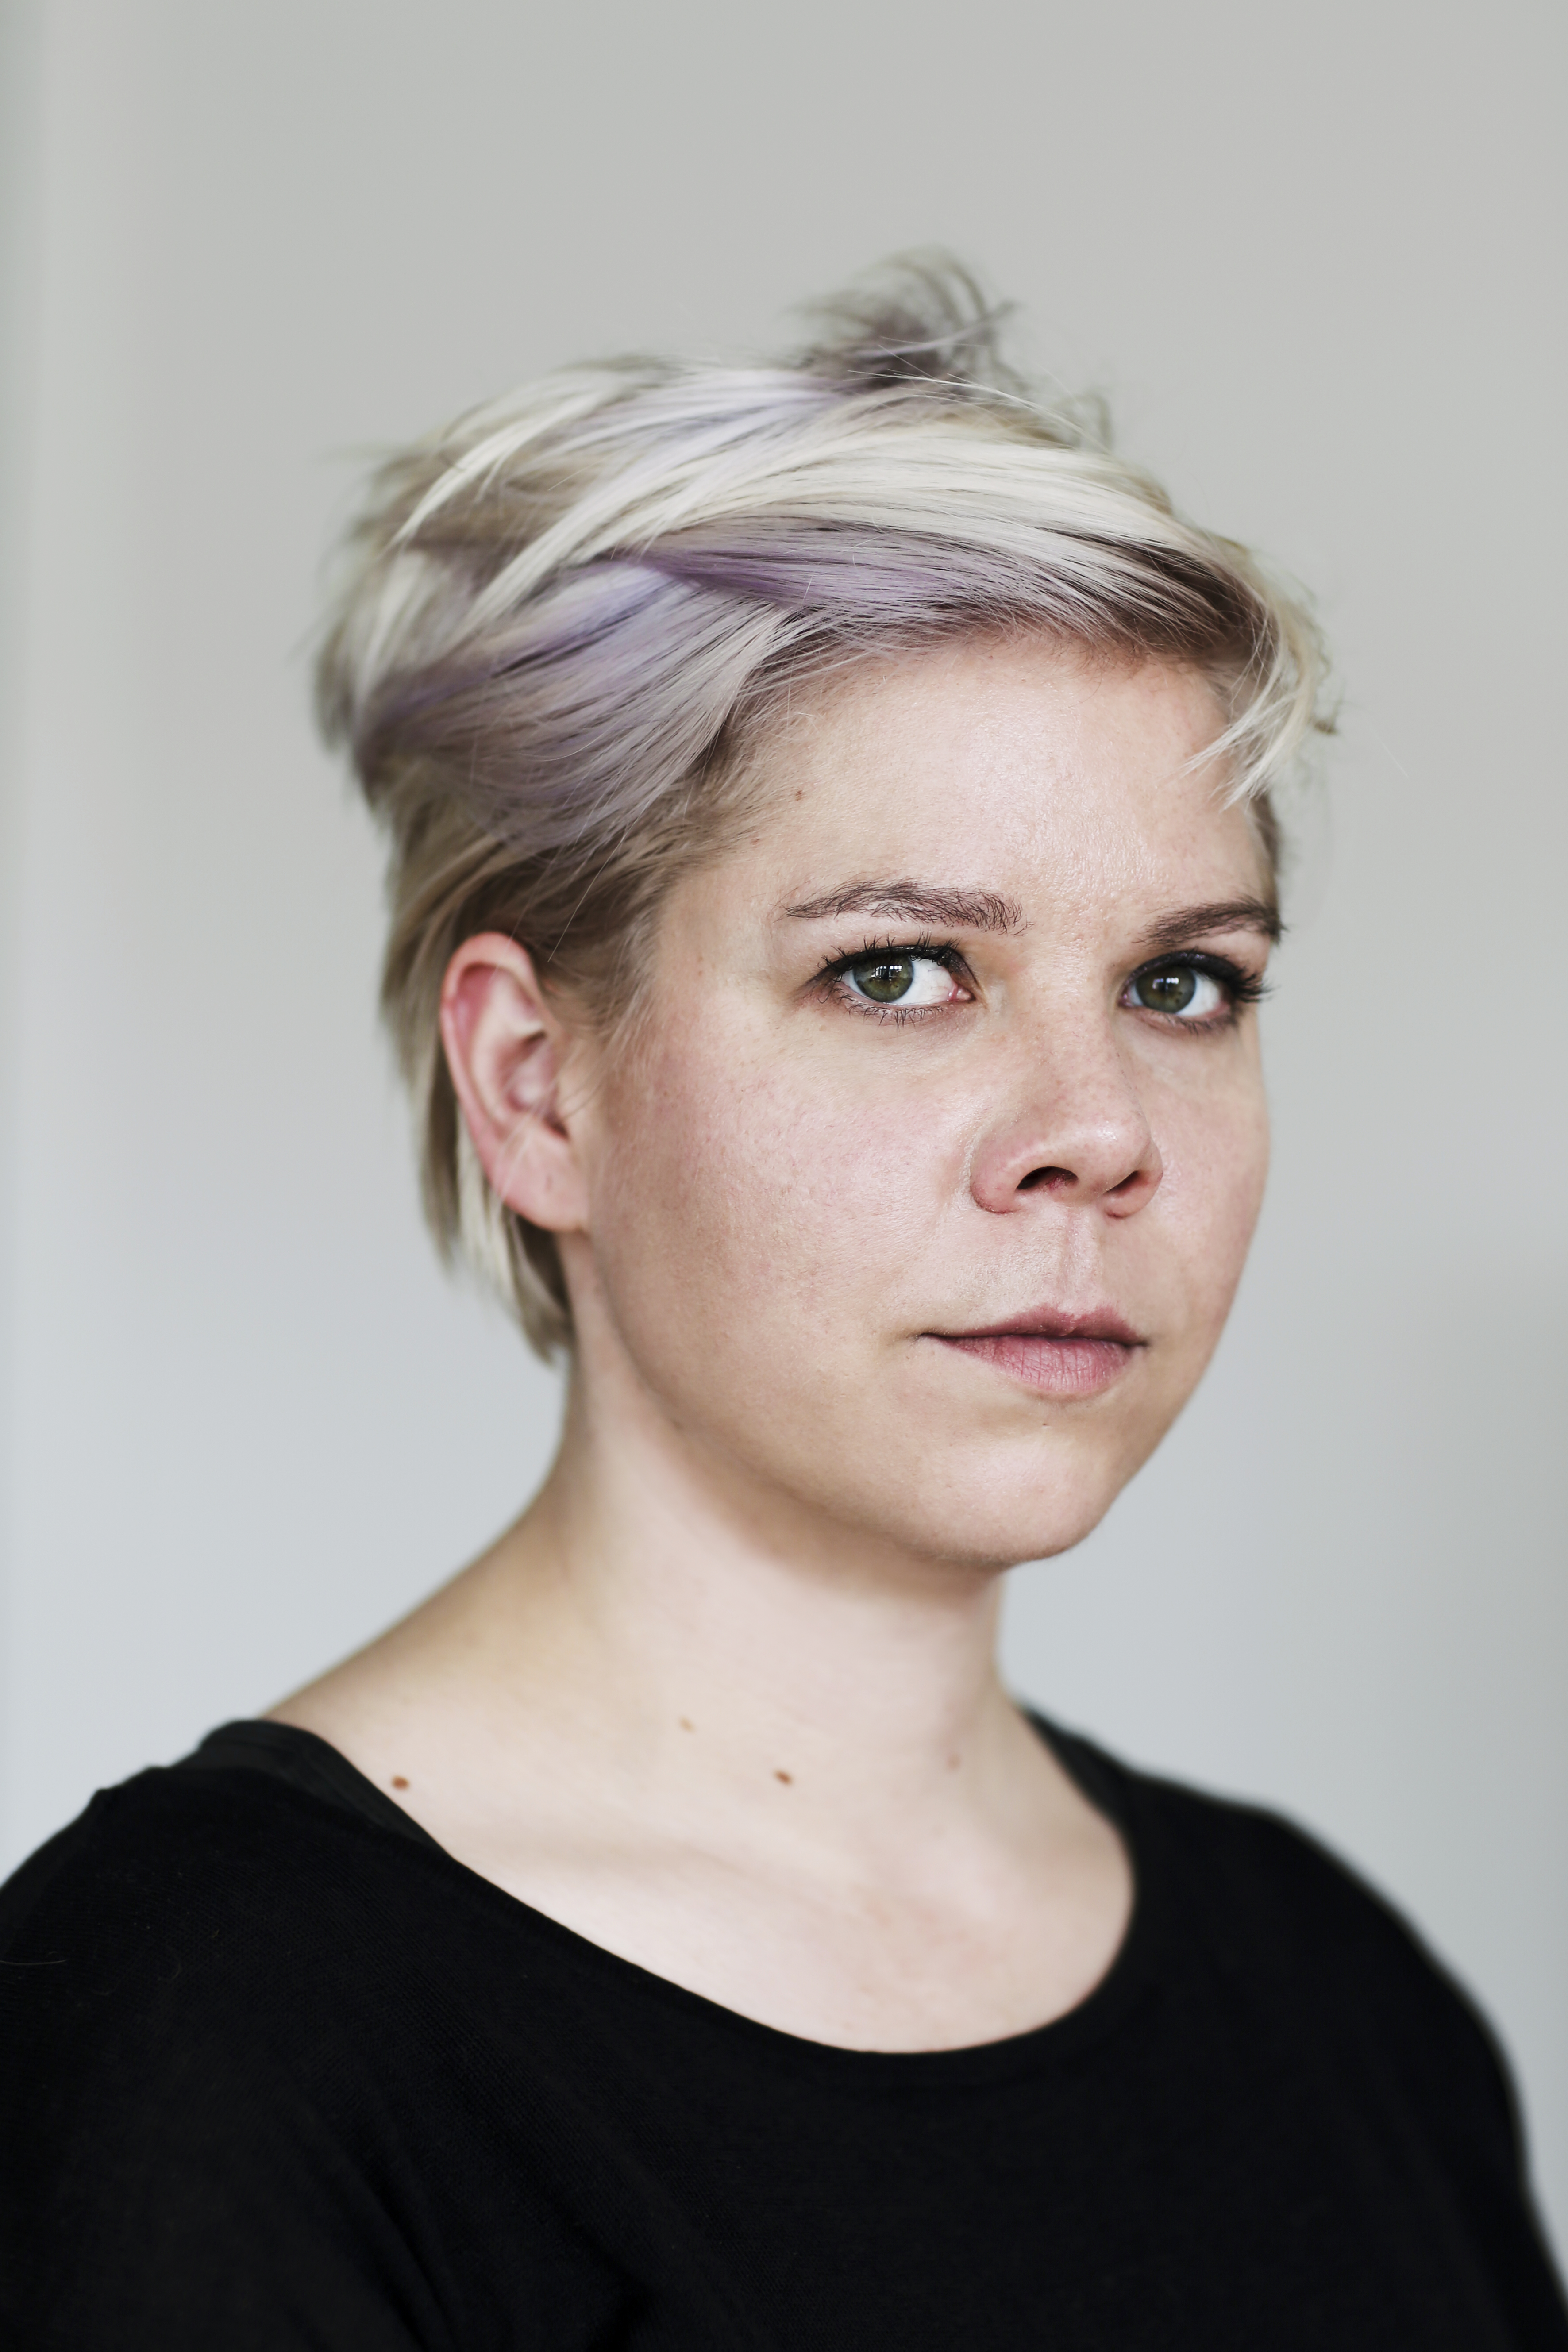 Alexa Vachon